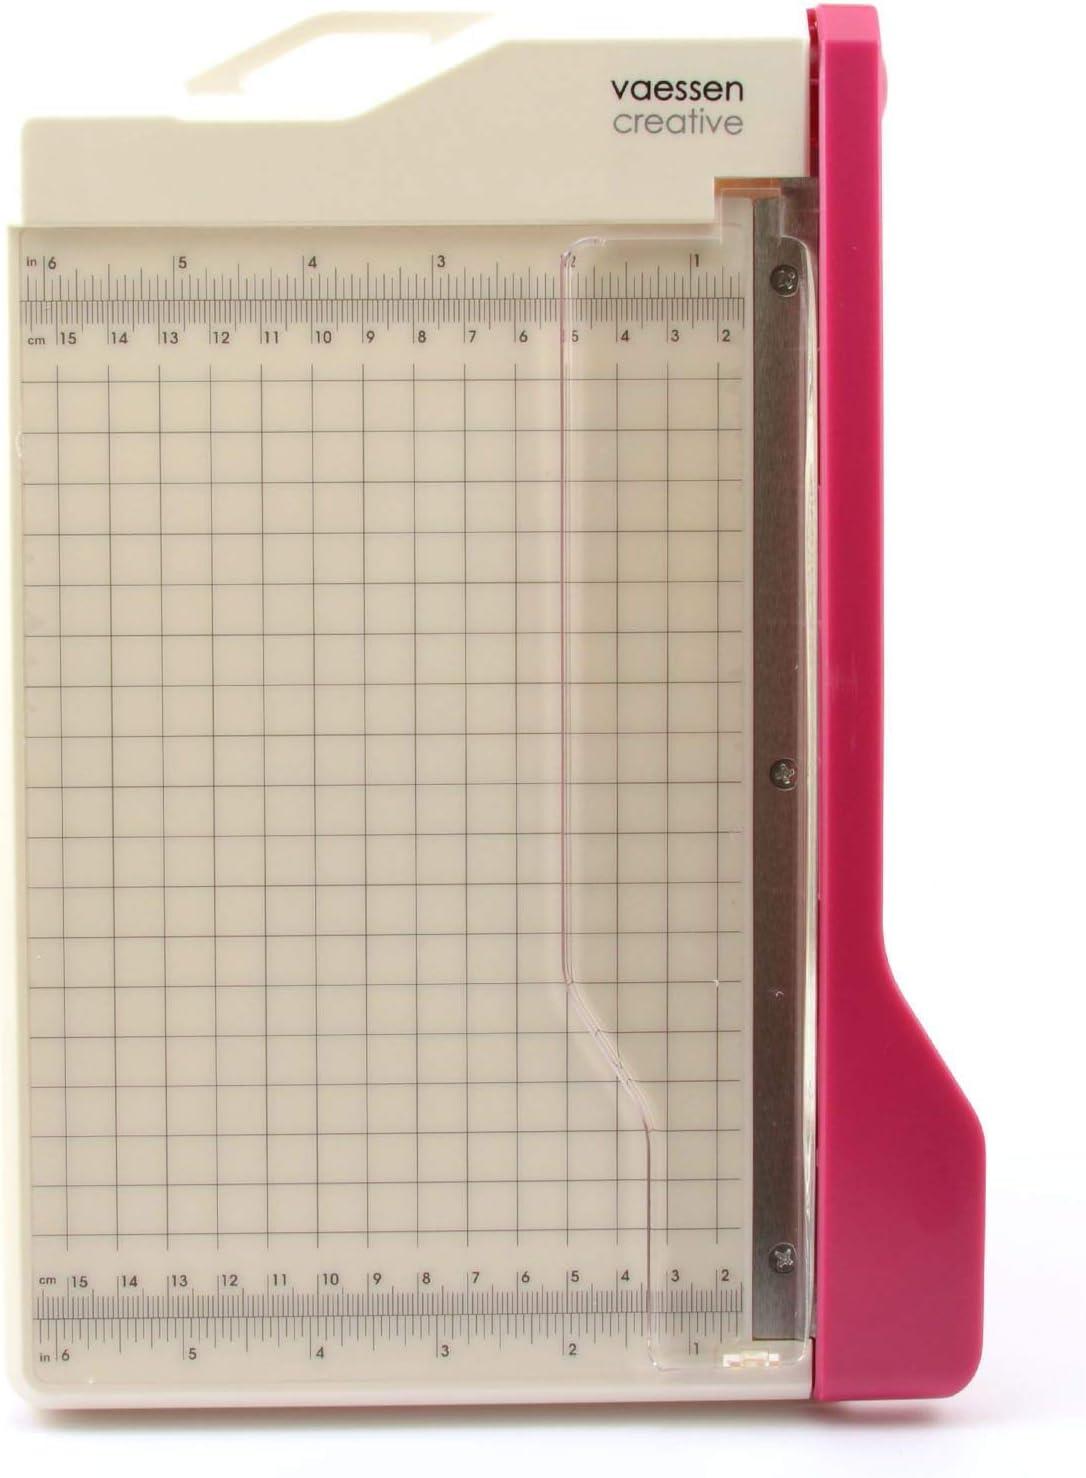 Washington Mall Vaessen Creative Trim Easy Guillotine Max 60% OFF Cutter 8.5 6 x Tr inches